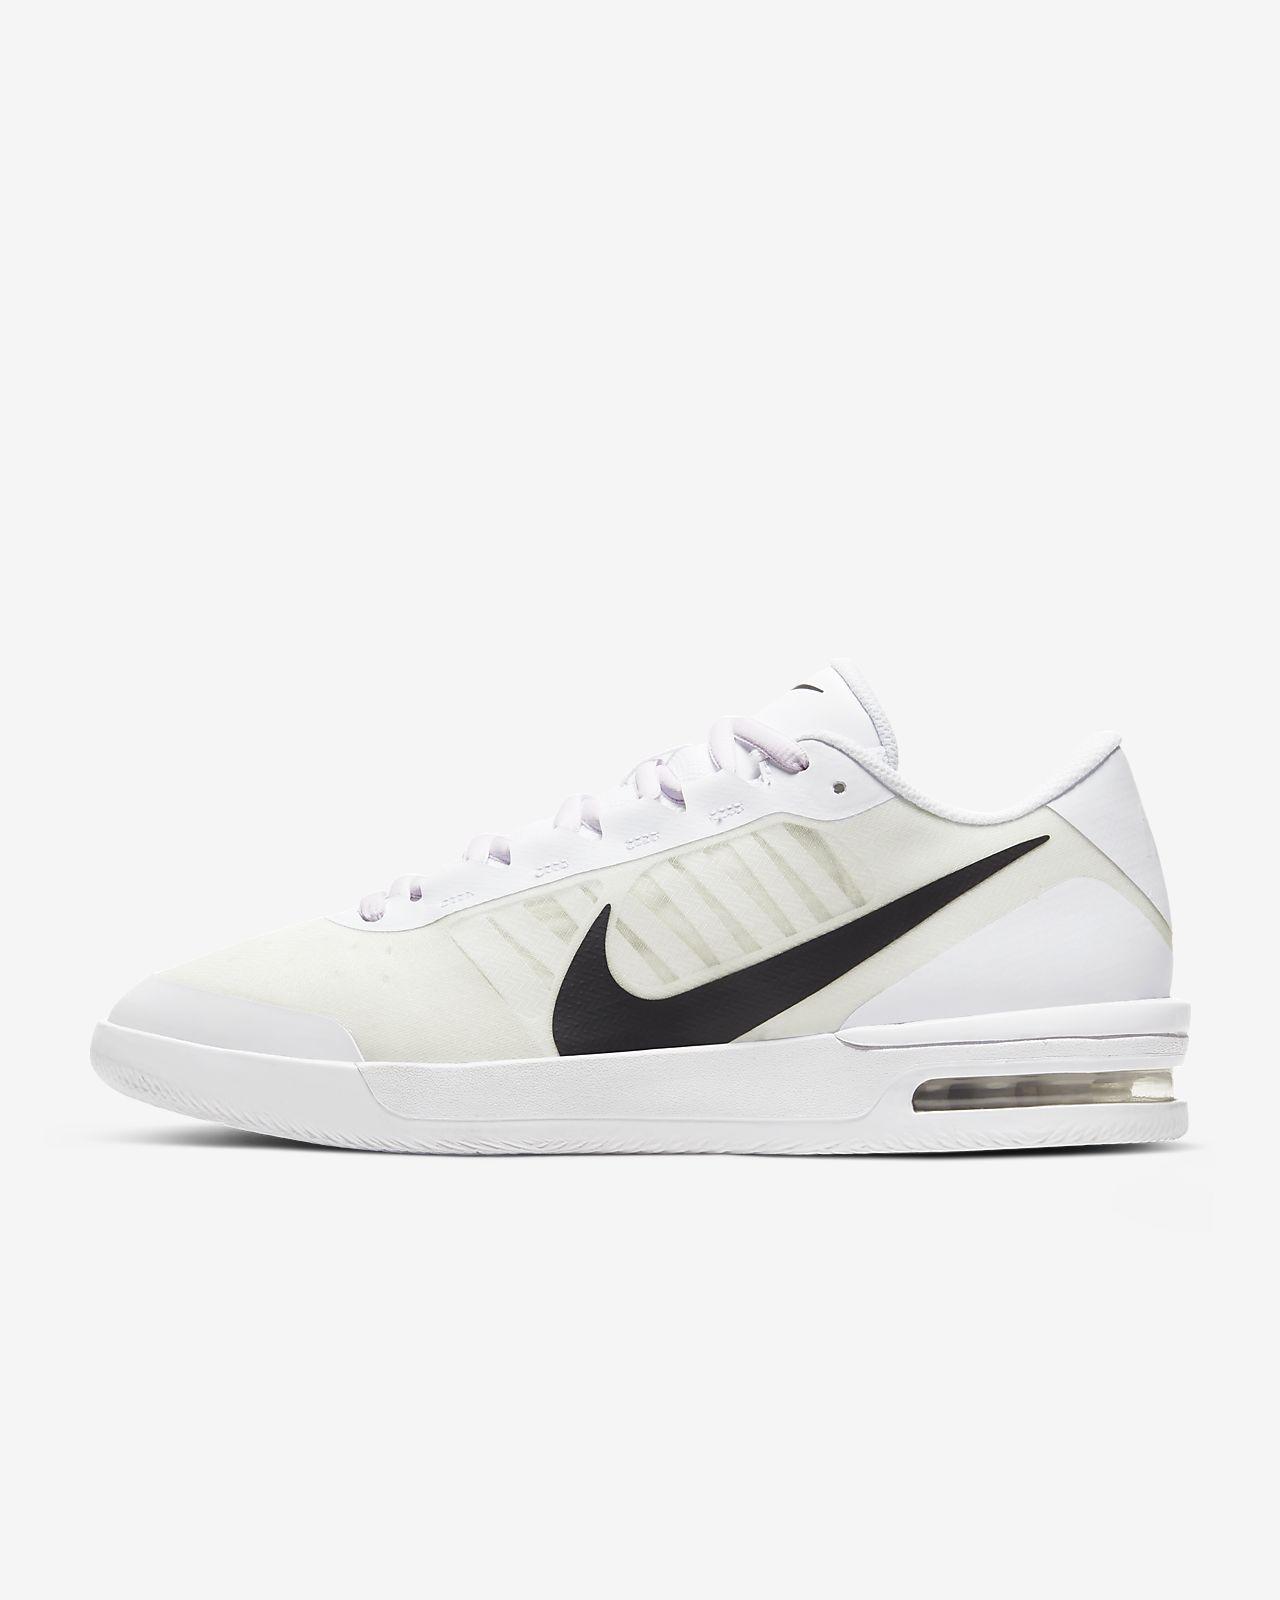 NikeCourt Air Max Vapor Wing MS Men's Multi-Surface Tennis Shoe